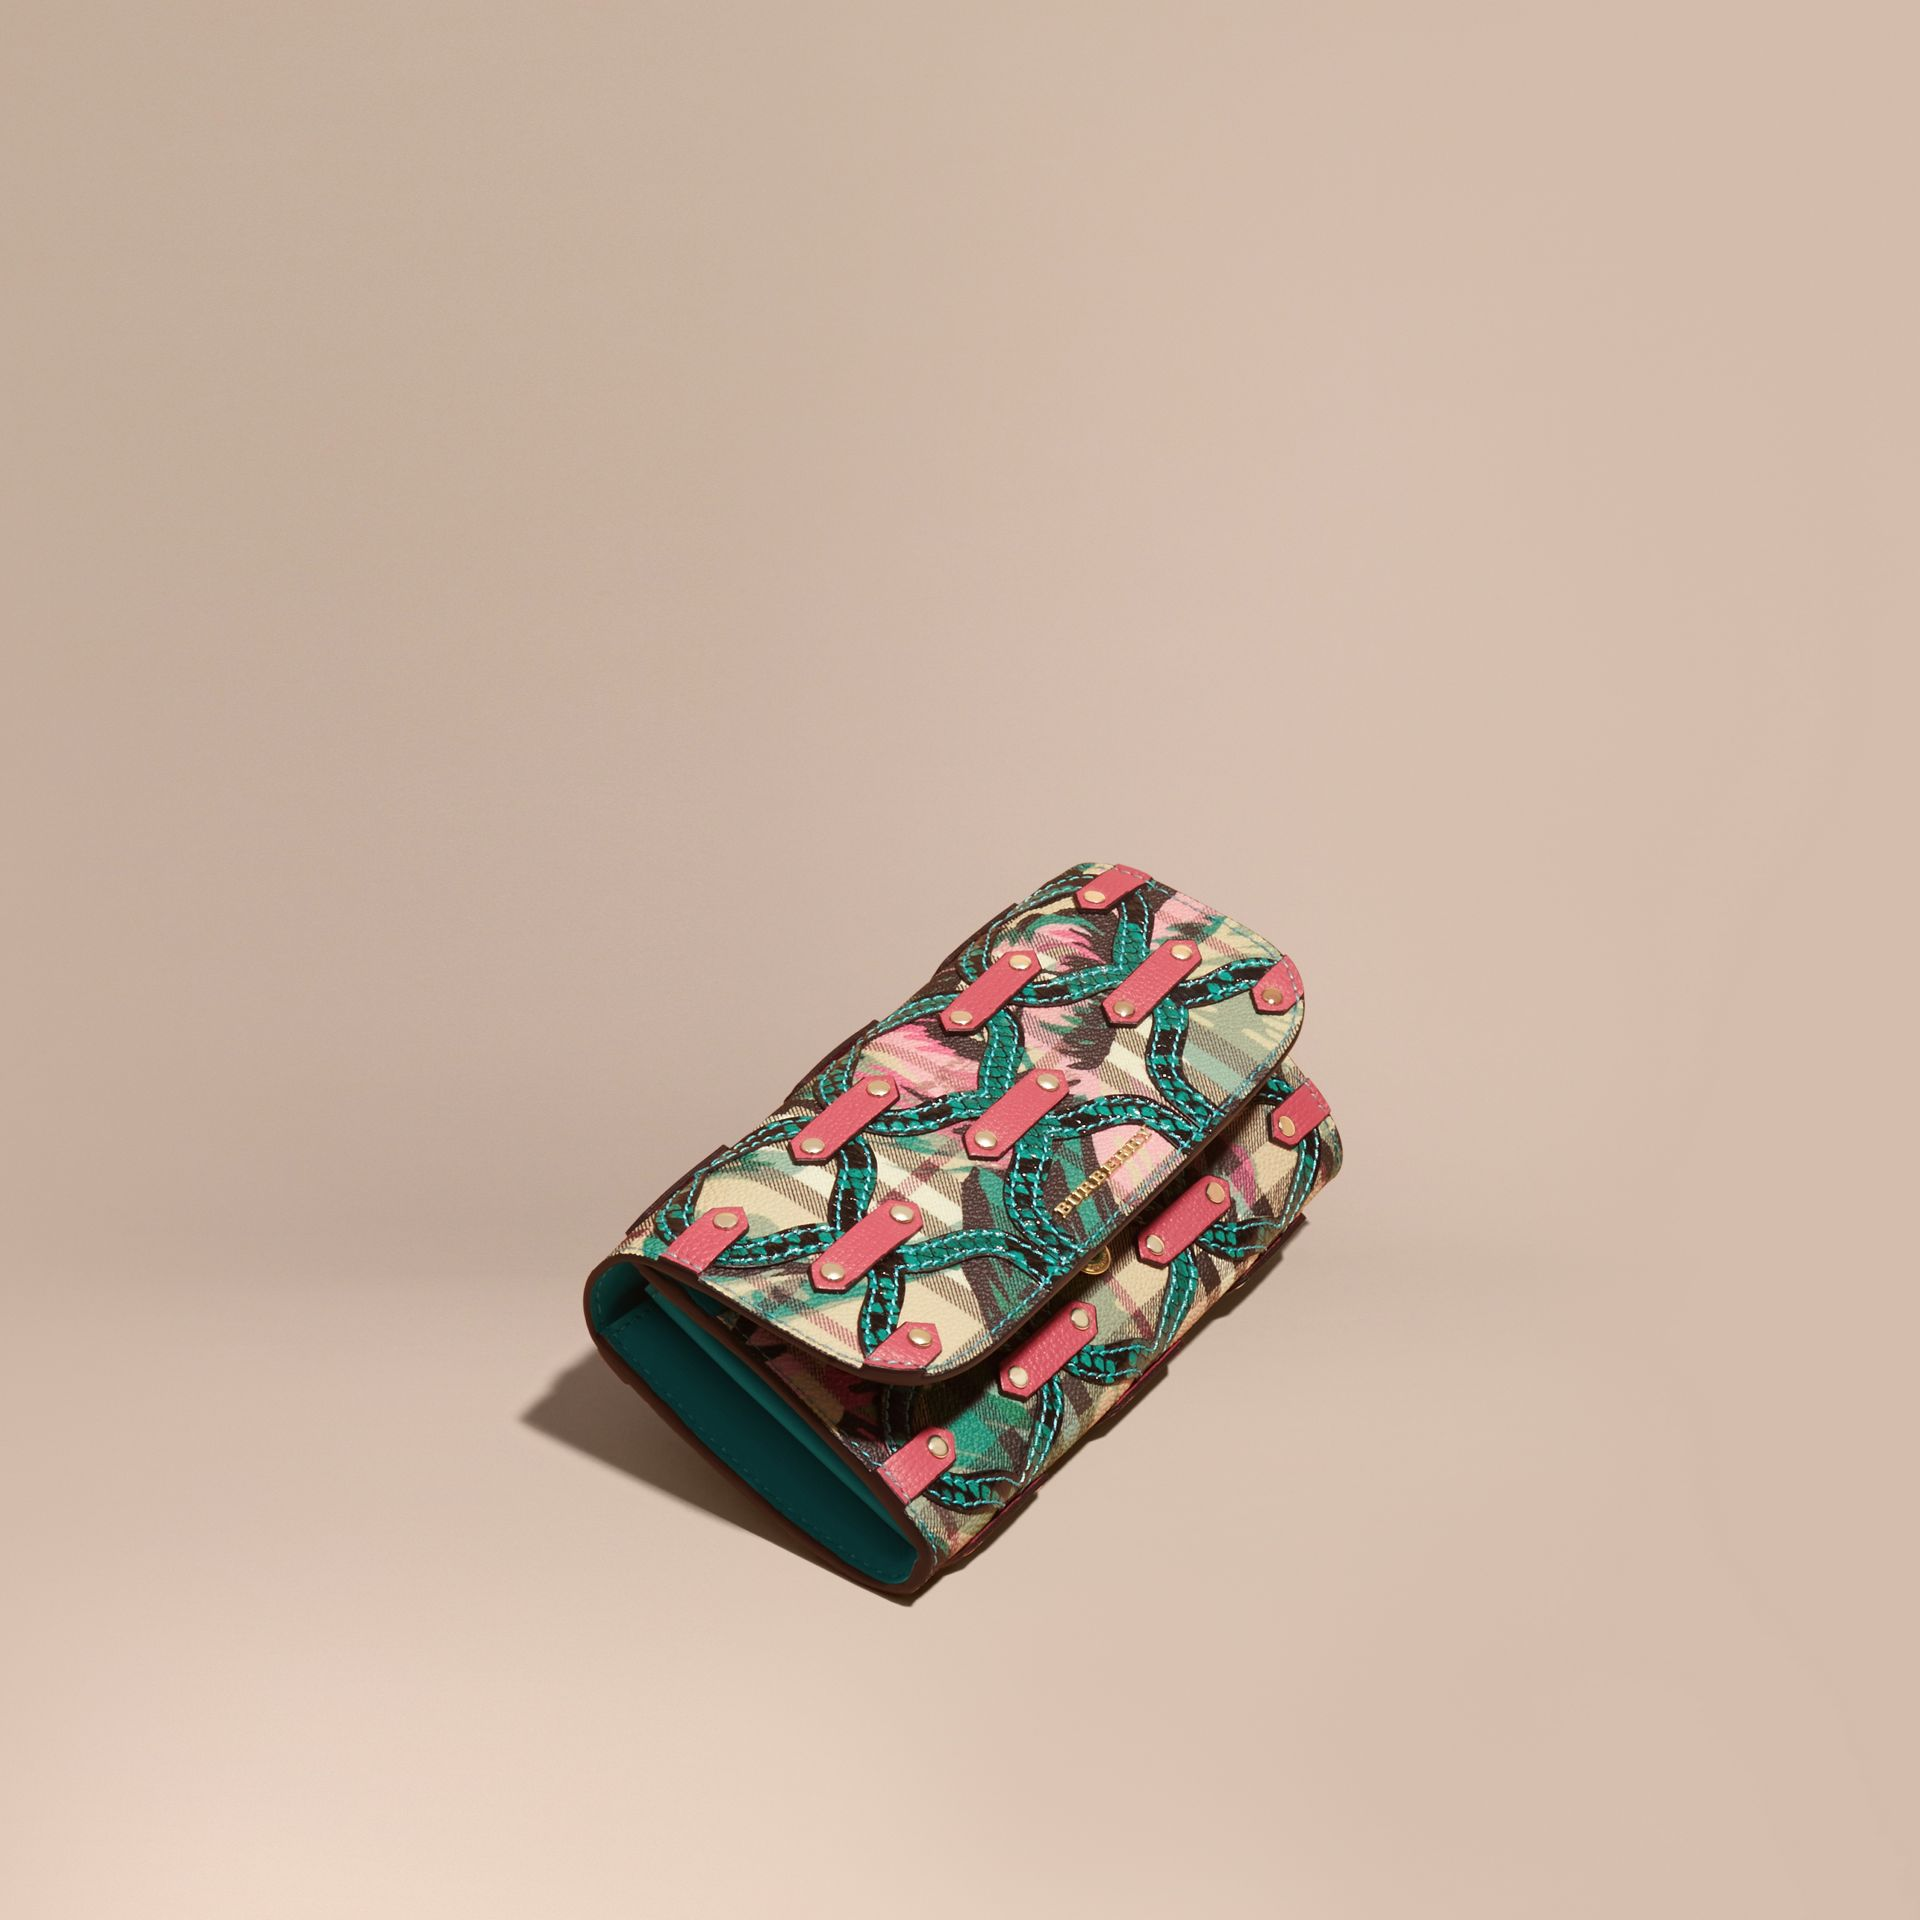 Snakeskin Appliqué Peony Rose Print Haymarket Check Continental Wallet in Plum Pink - gallery image 1